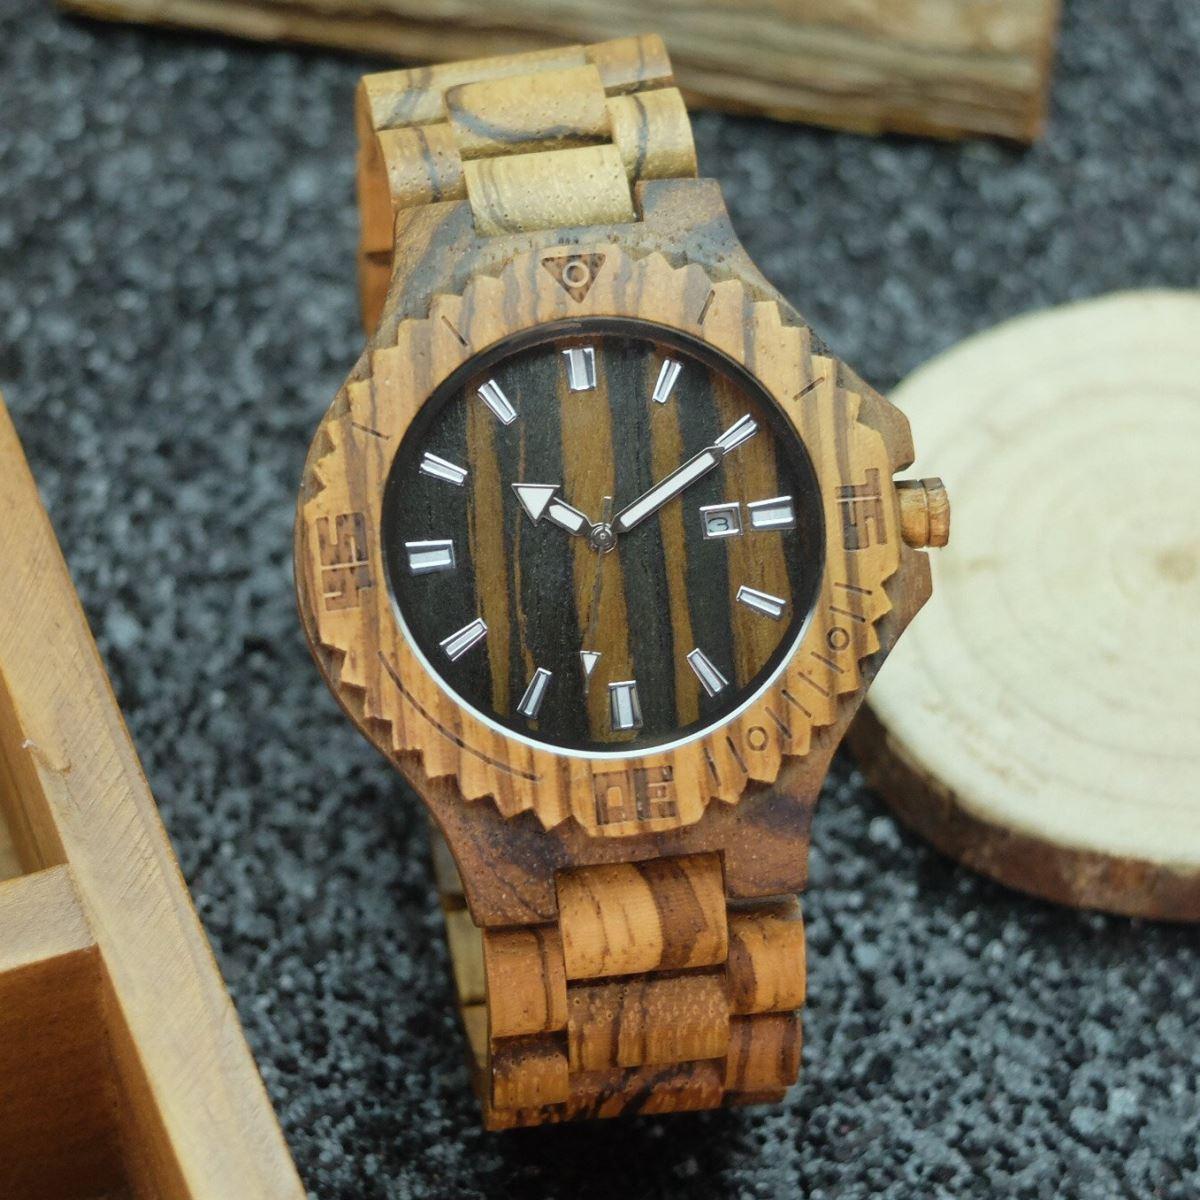 2018 Fashion Casual Wooden Quartz Watch for Men Women Calendar Luminous Pointers luxury wood dress Watches relogio<br>